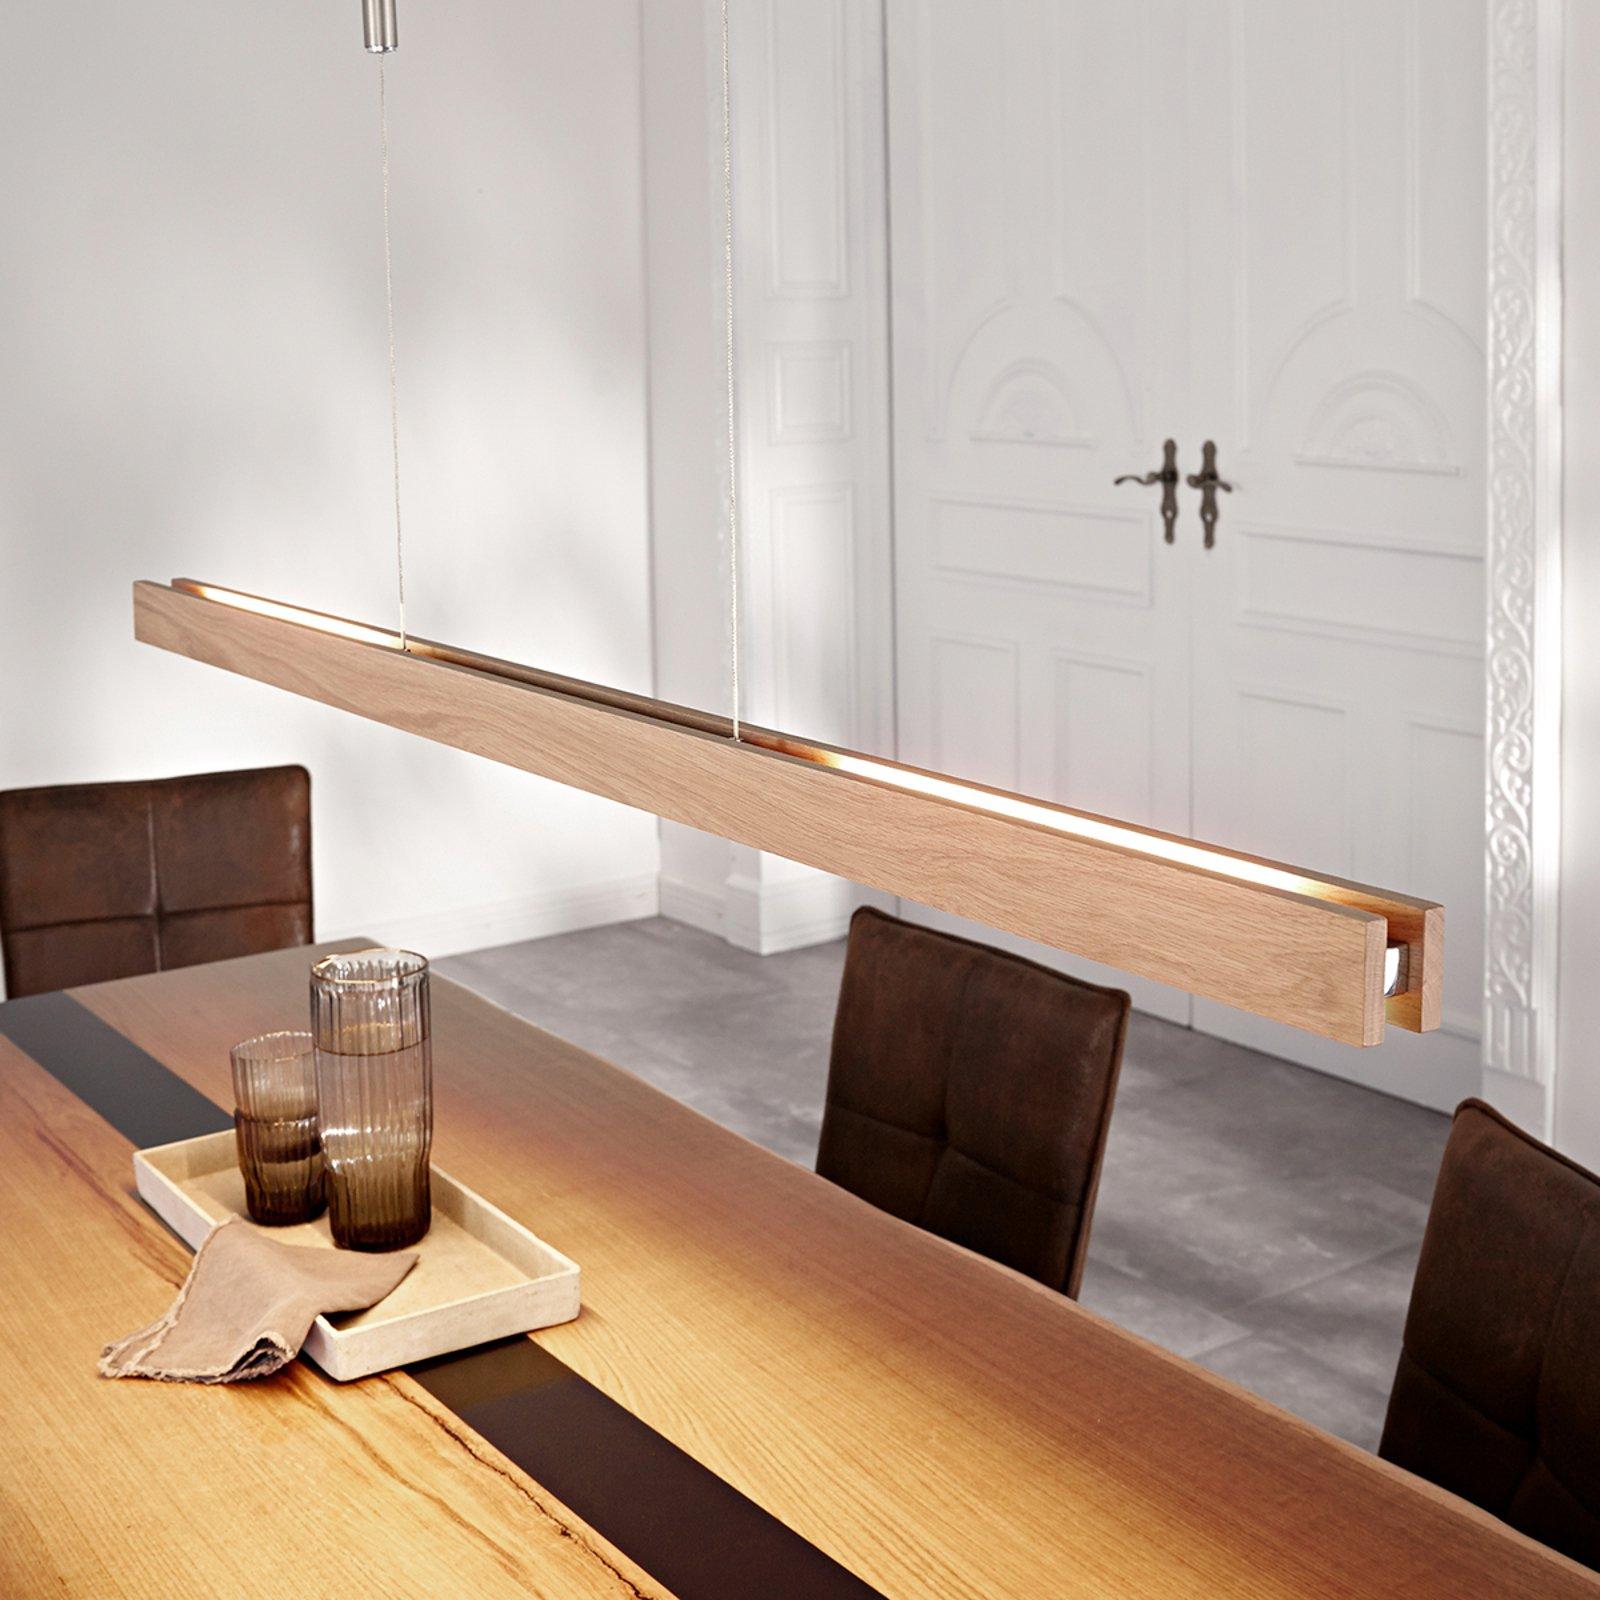 Tre-LED-taklampe Alin, eik natur, 138 cm